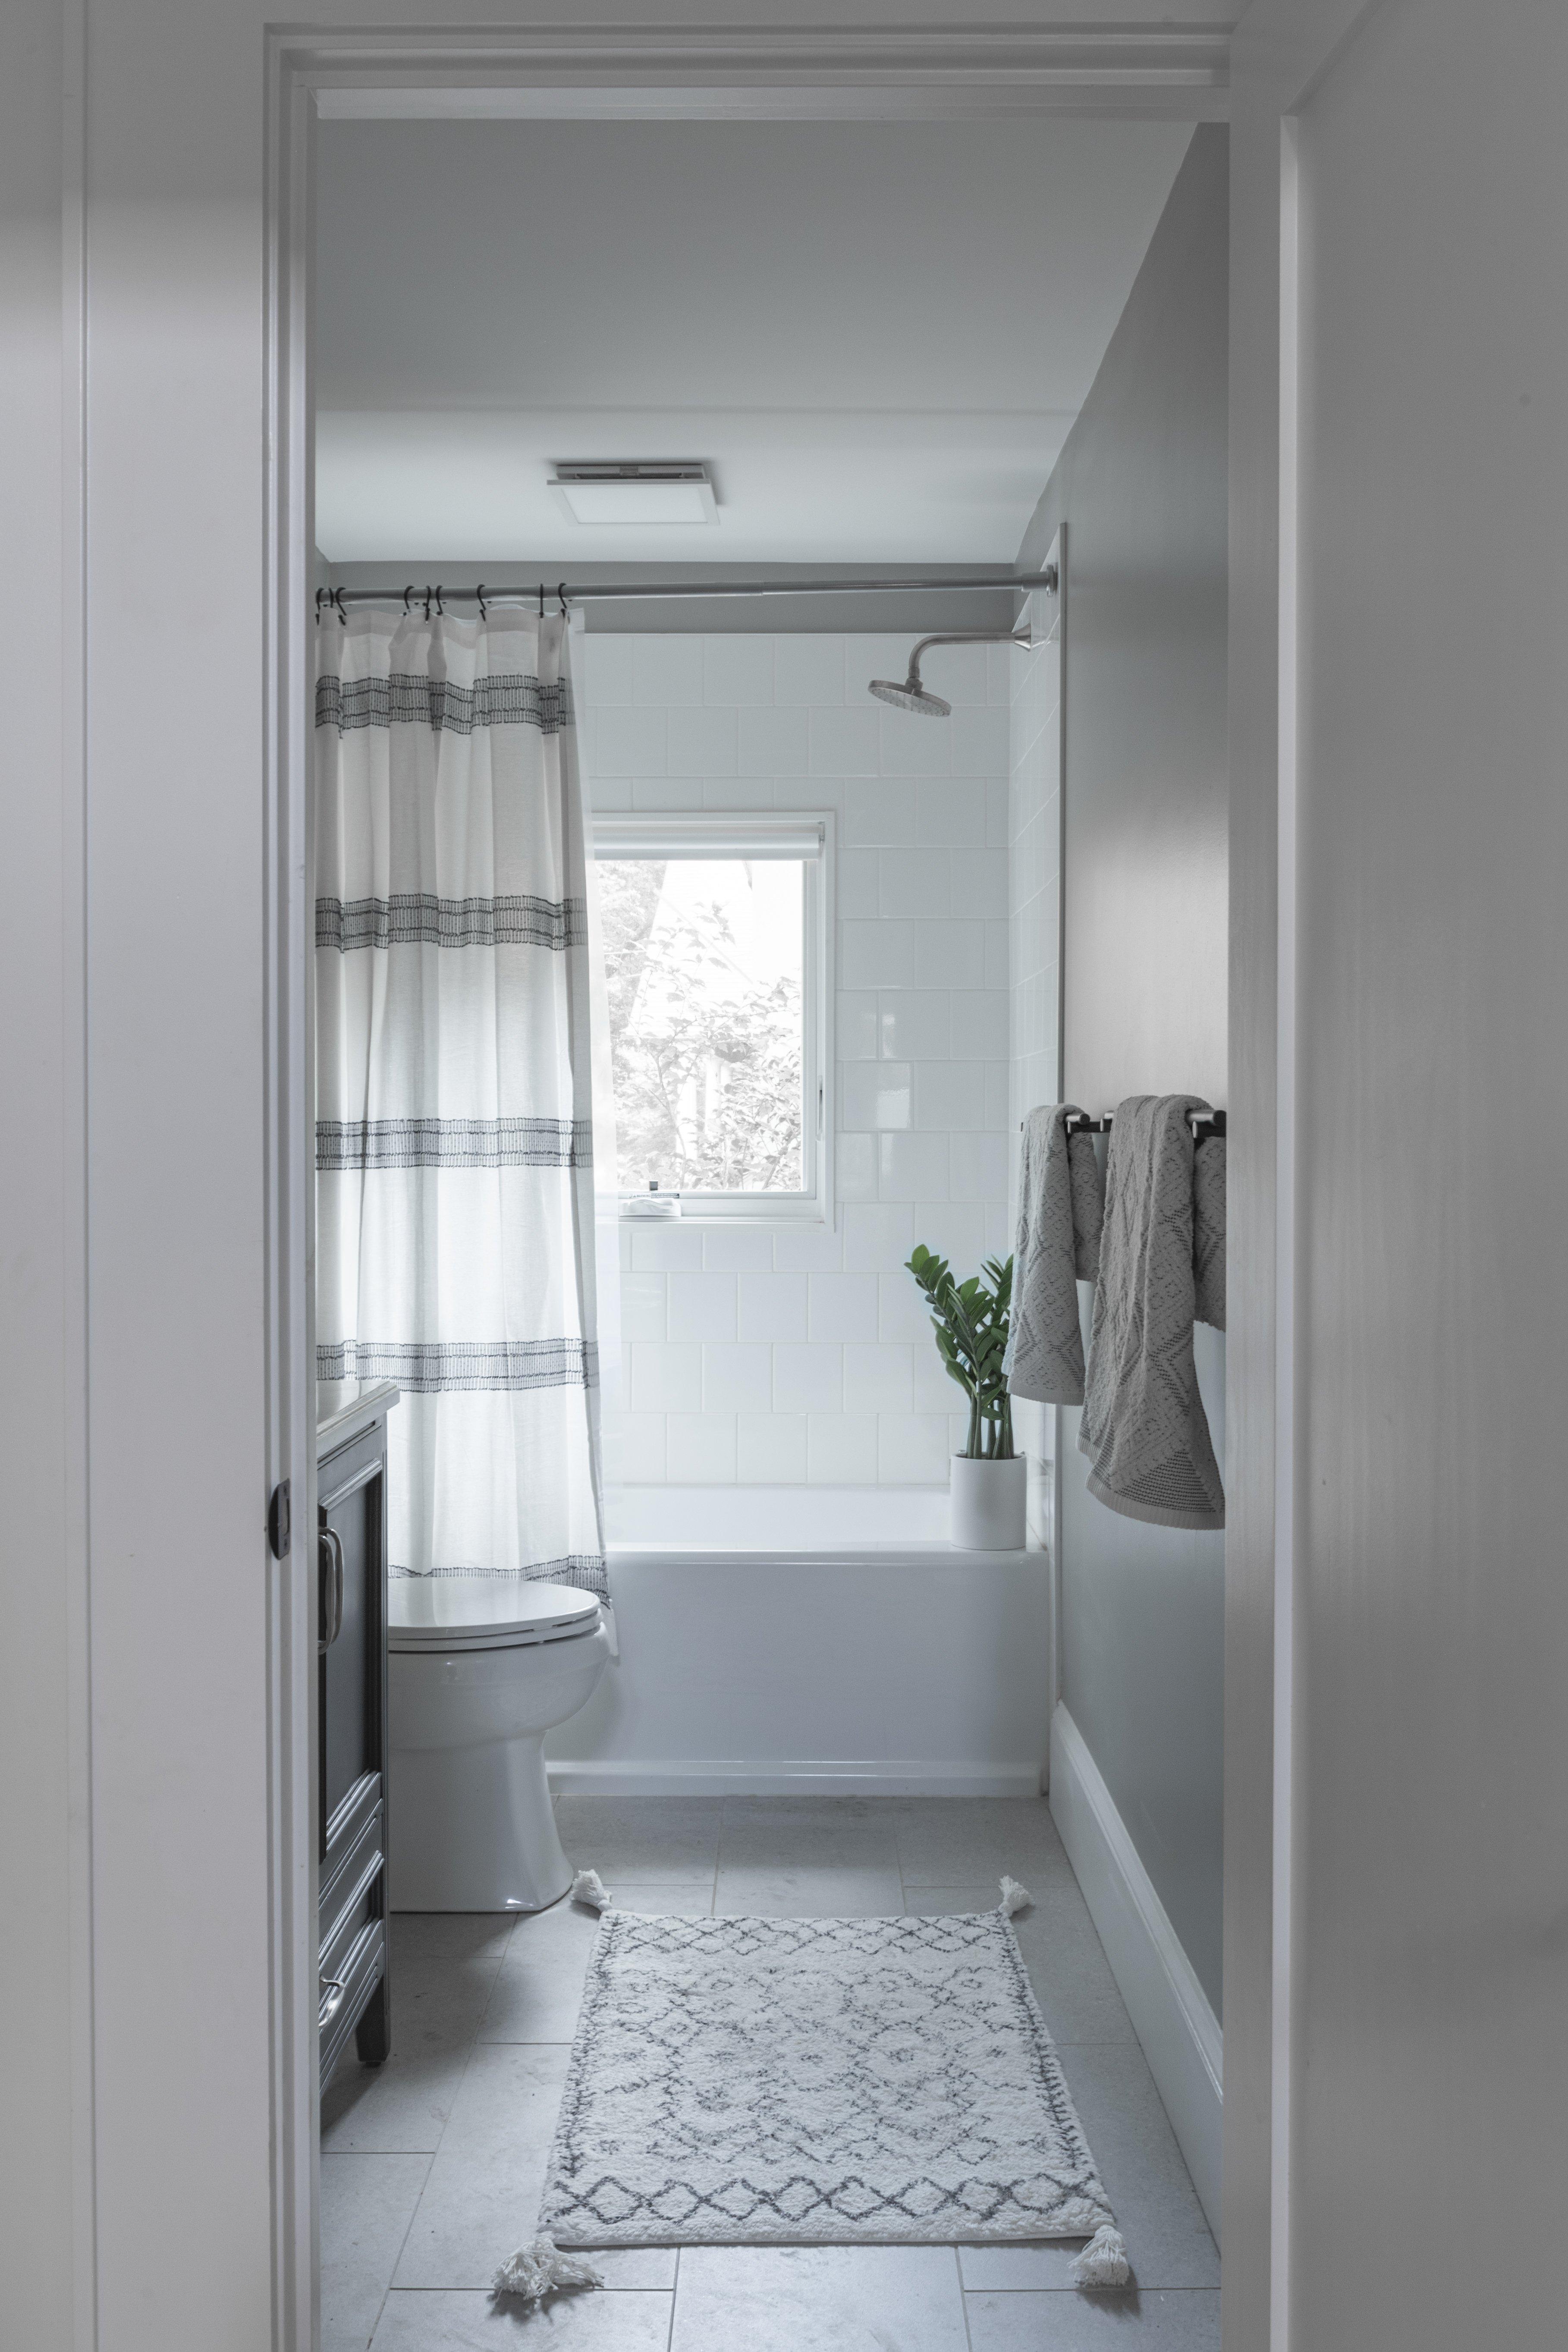 22 bathroom 2 20210721-IMG_0357-HDR.jpg